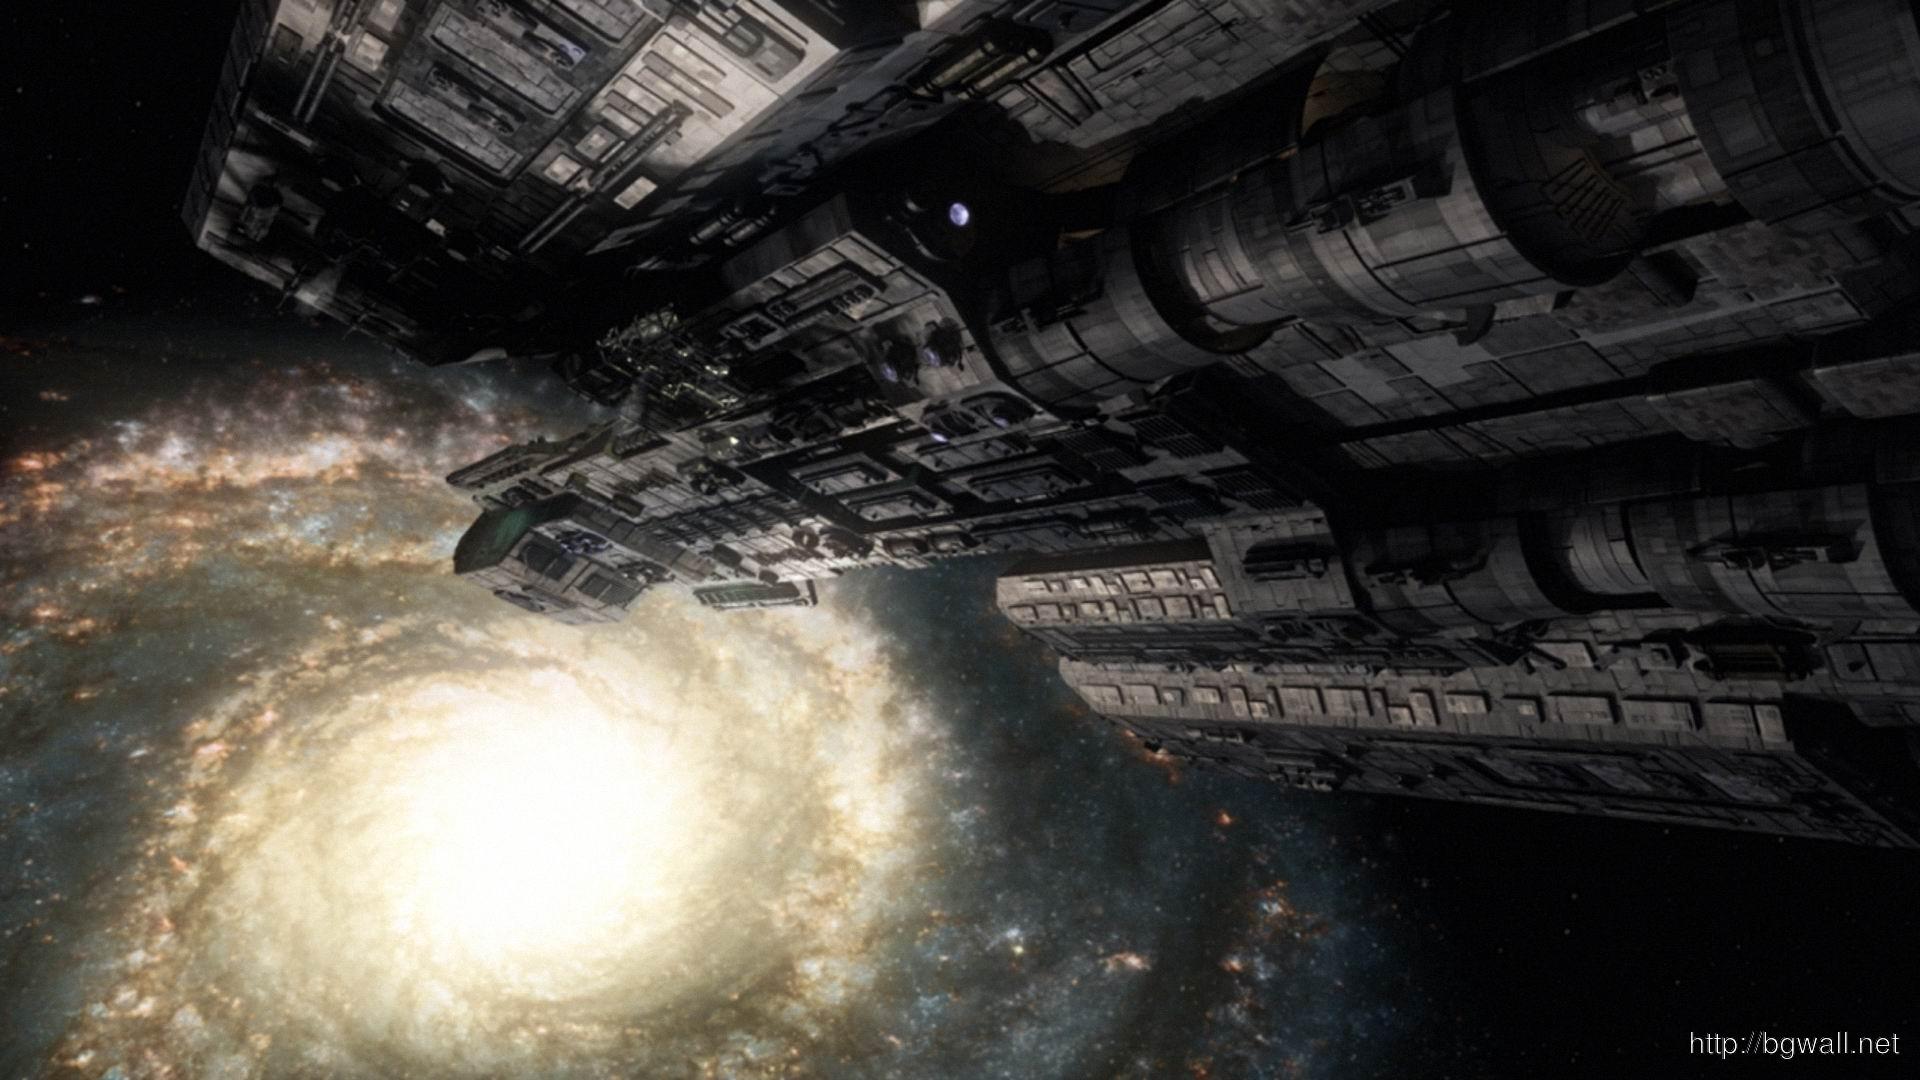 Stargate Atlantis Spaceship Wallpaper 5805 Full Size